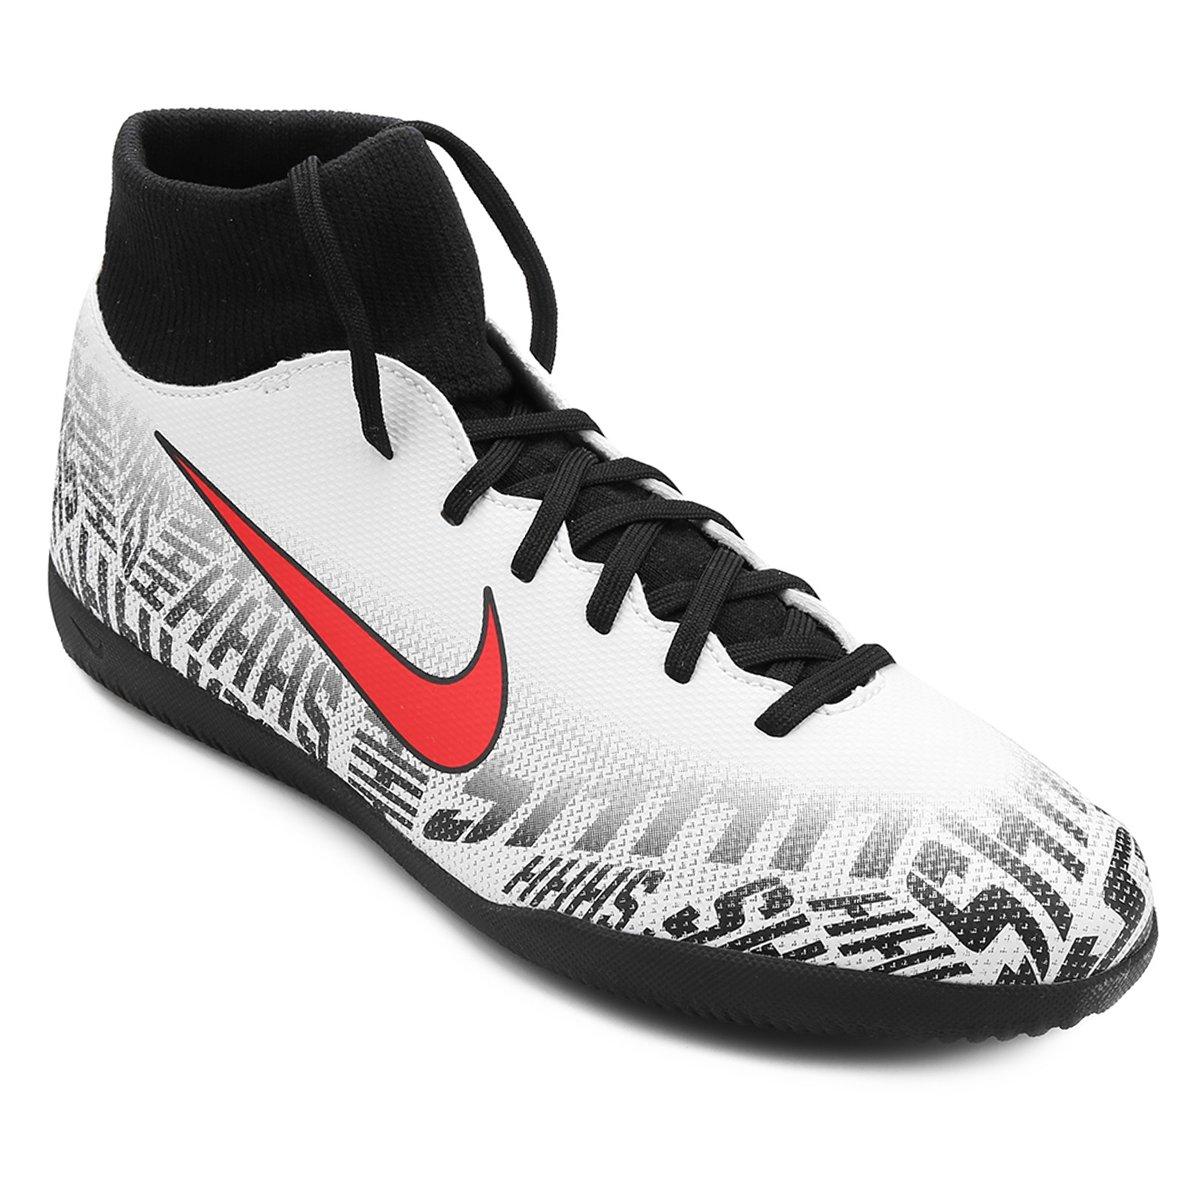 494819aa3ca68 Chuteira Futsal Nike Mercurial Superfly 6 Club Neymar Jr IC - Branco e  Vermelho - Compre Agora